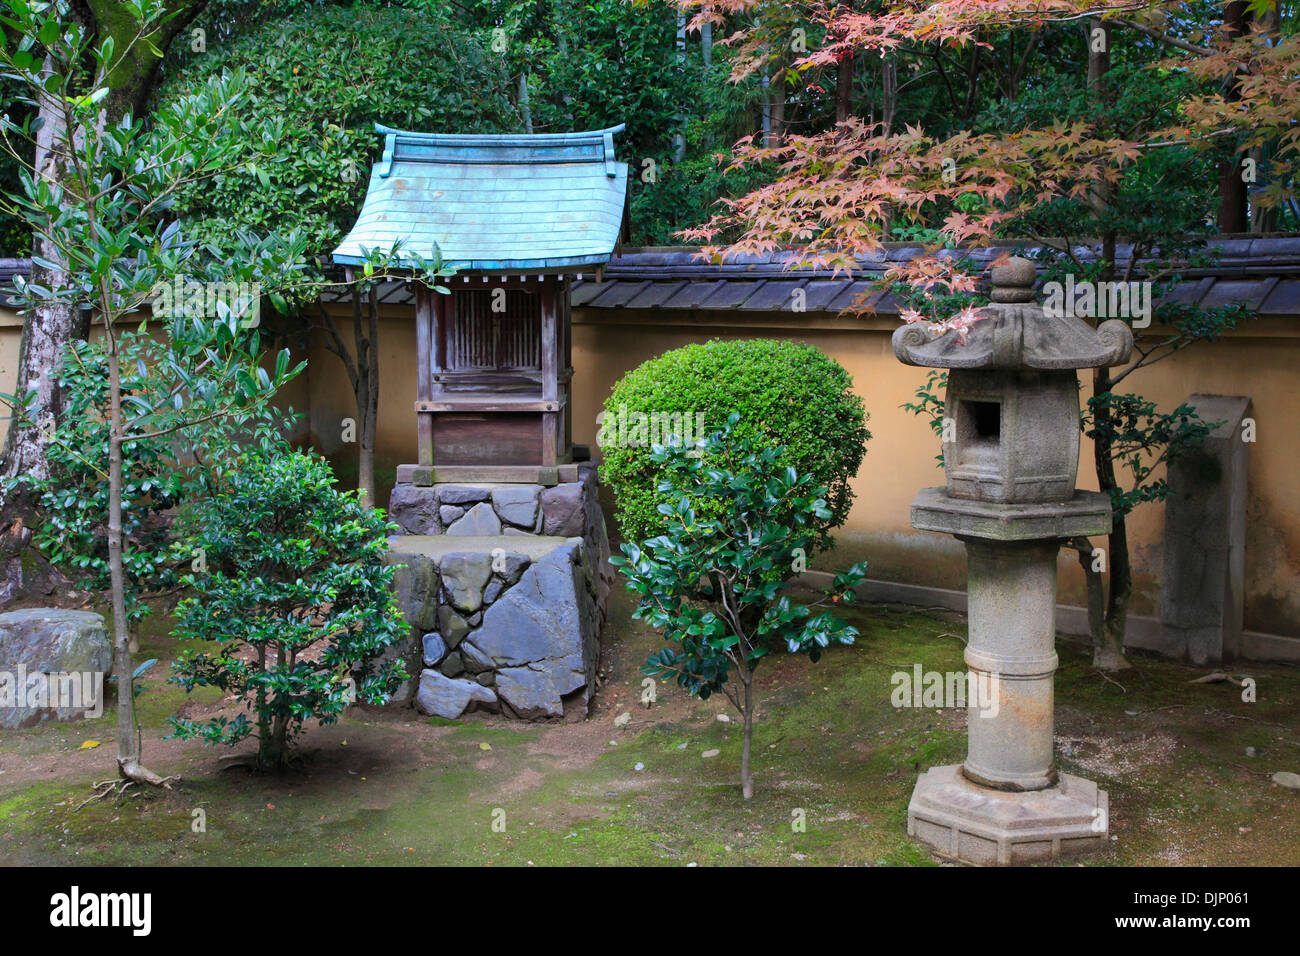 Japan, Kyoto, Daitokuji Temple, Kourin-in, garden, - Stock Image